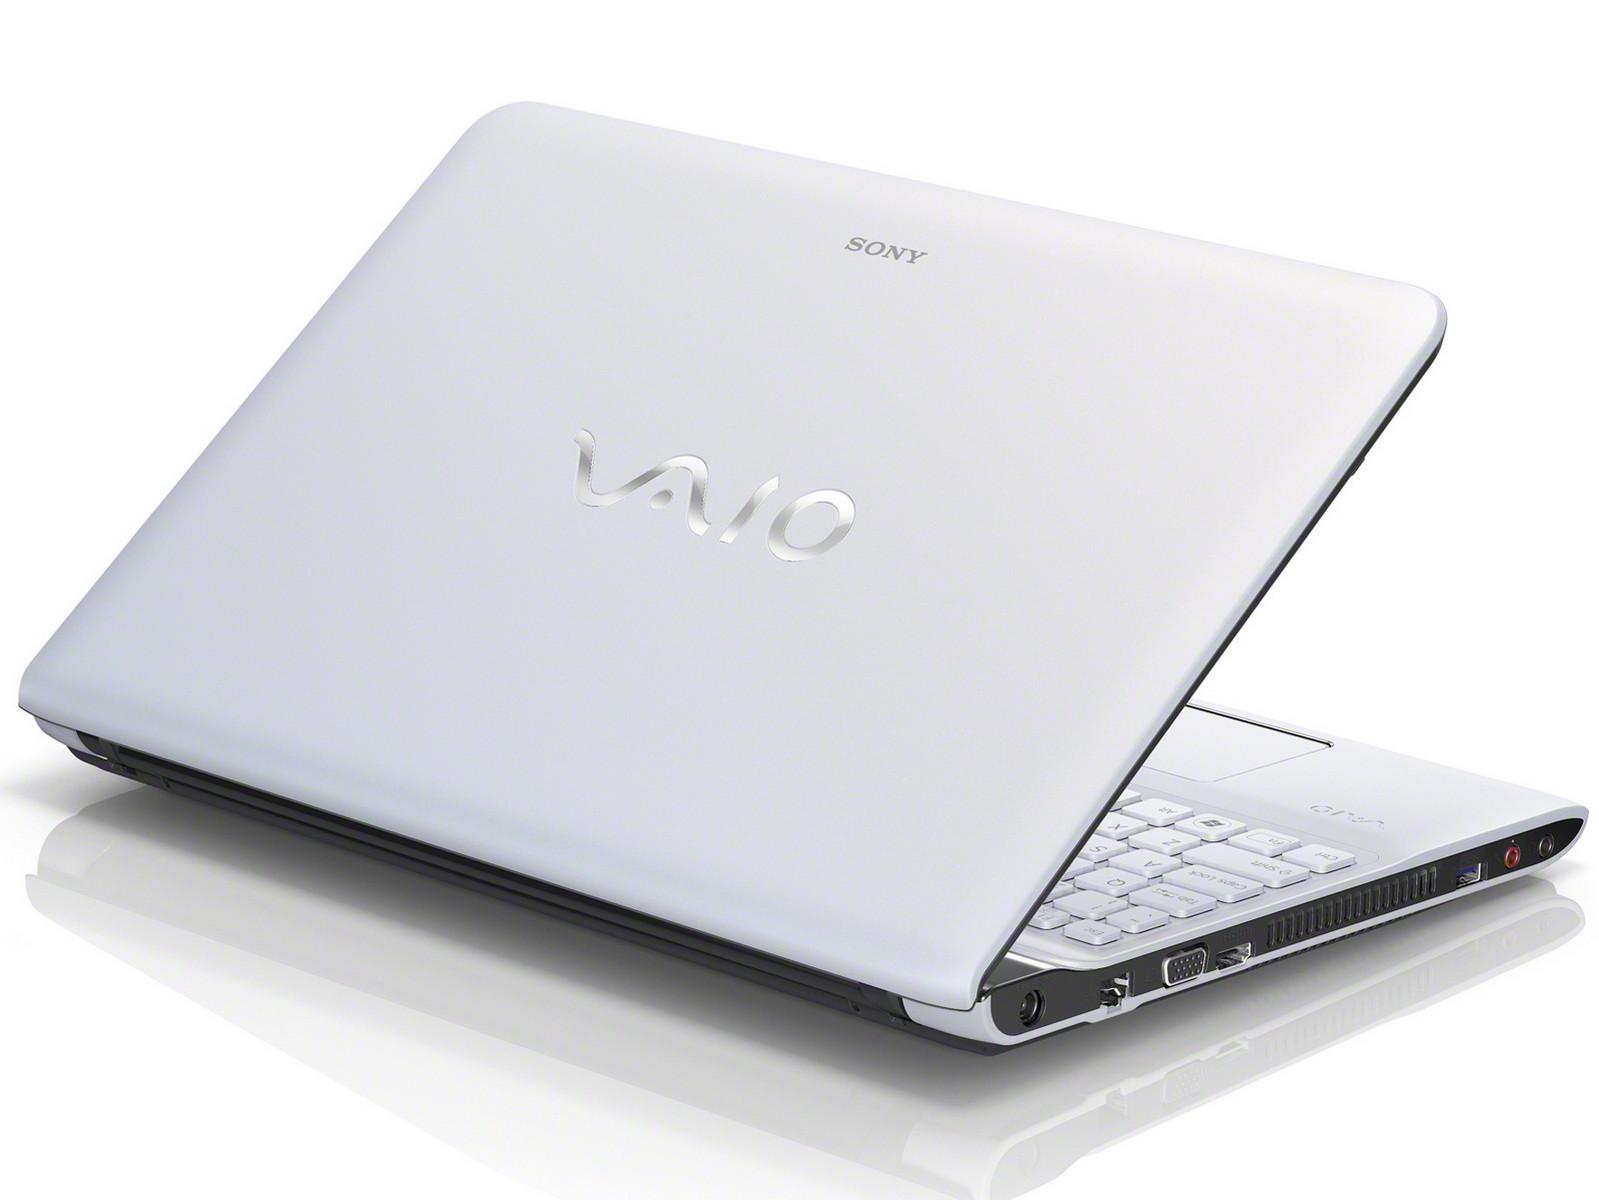 http://www.notebookcheck.com/fileadmin/_processed_/csm_VAIO_E-Serie_15_von_Sony_weiss_02_89350c981d.jpg